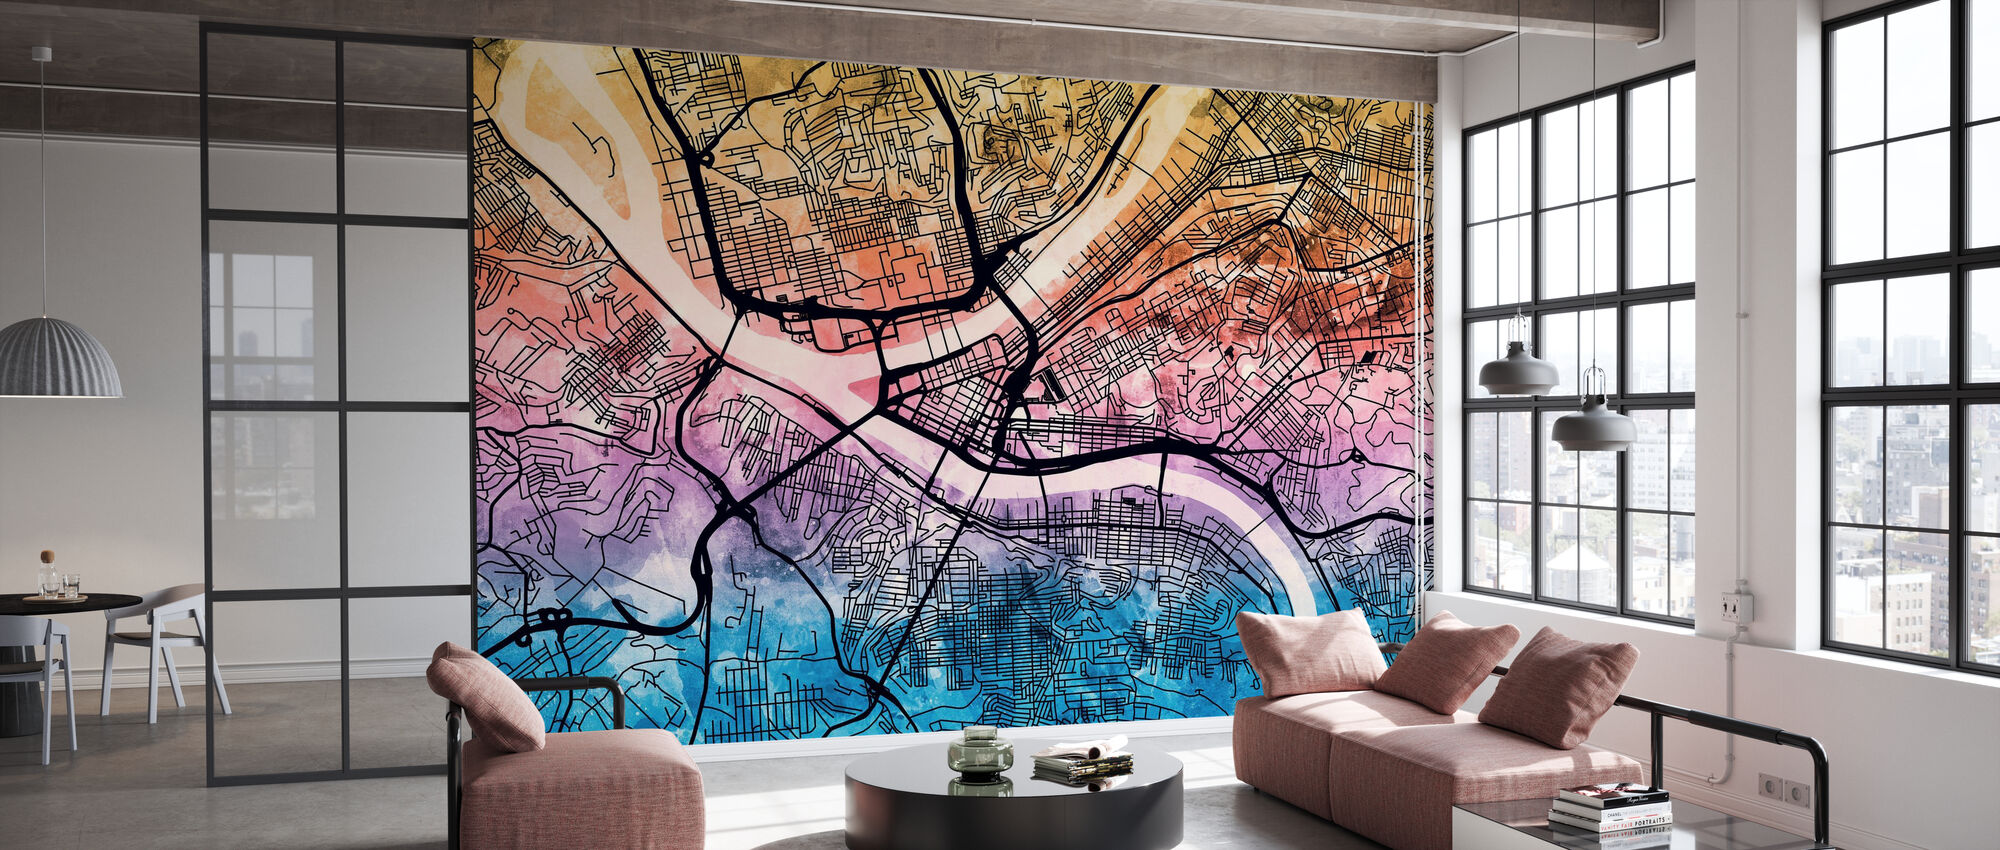 Pittsburgh Pennsylvania Street Map - Wallpaper - Office